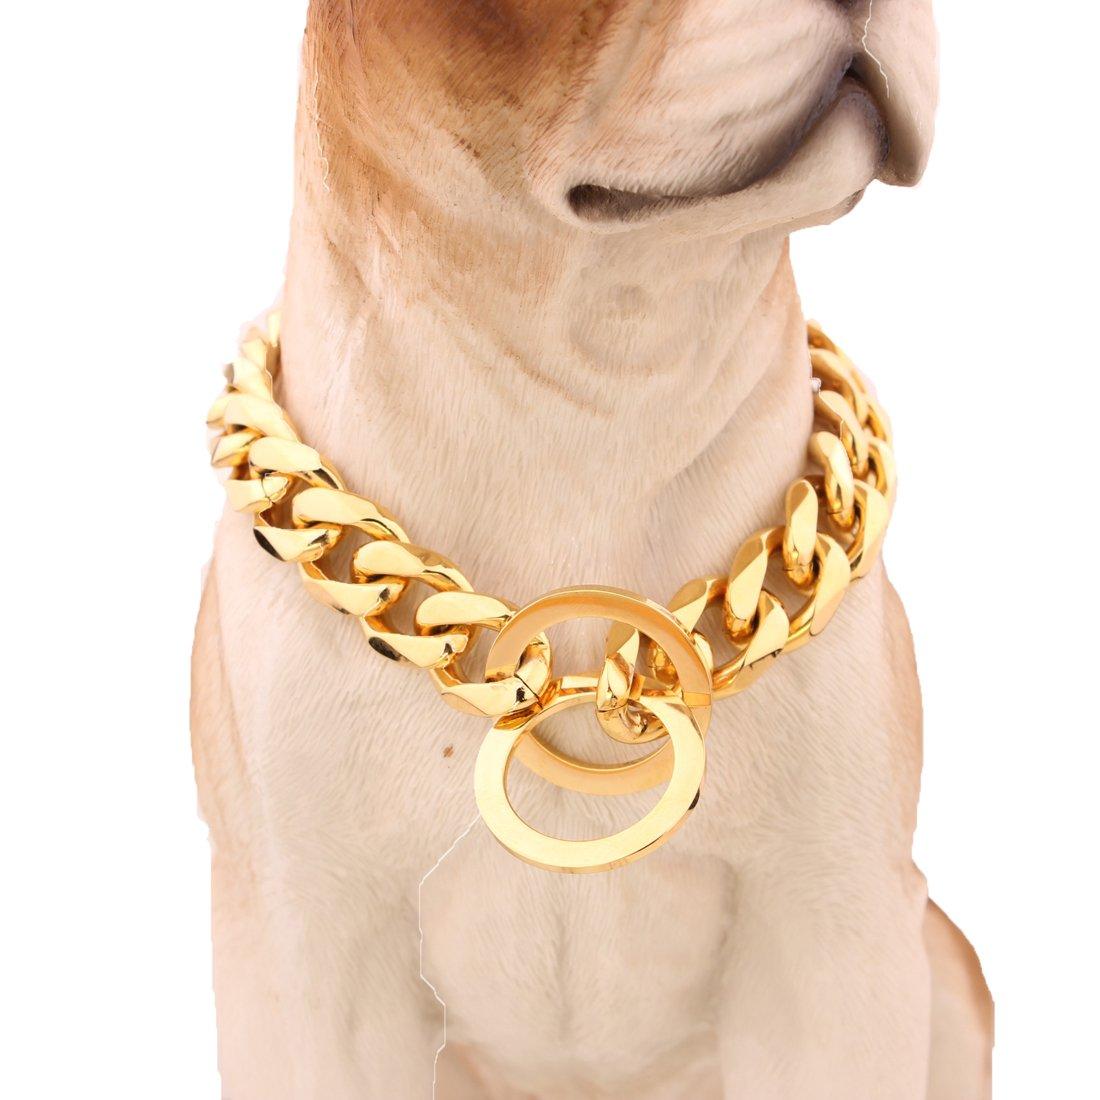 MCSAYS 15mm Largo Hip Hop Tono dorato Curb Cuban Link Acciaio inossidabile 316L Dog Choke Collare a catena 16-34(18 pollici)